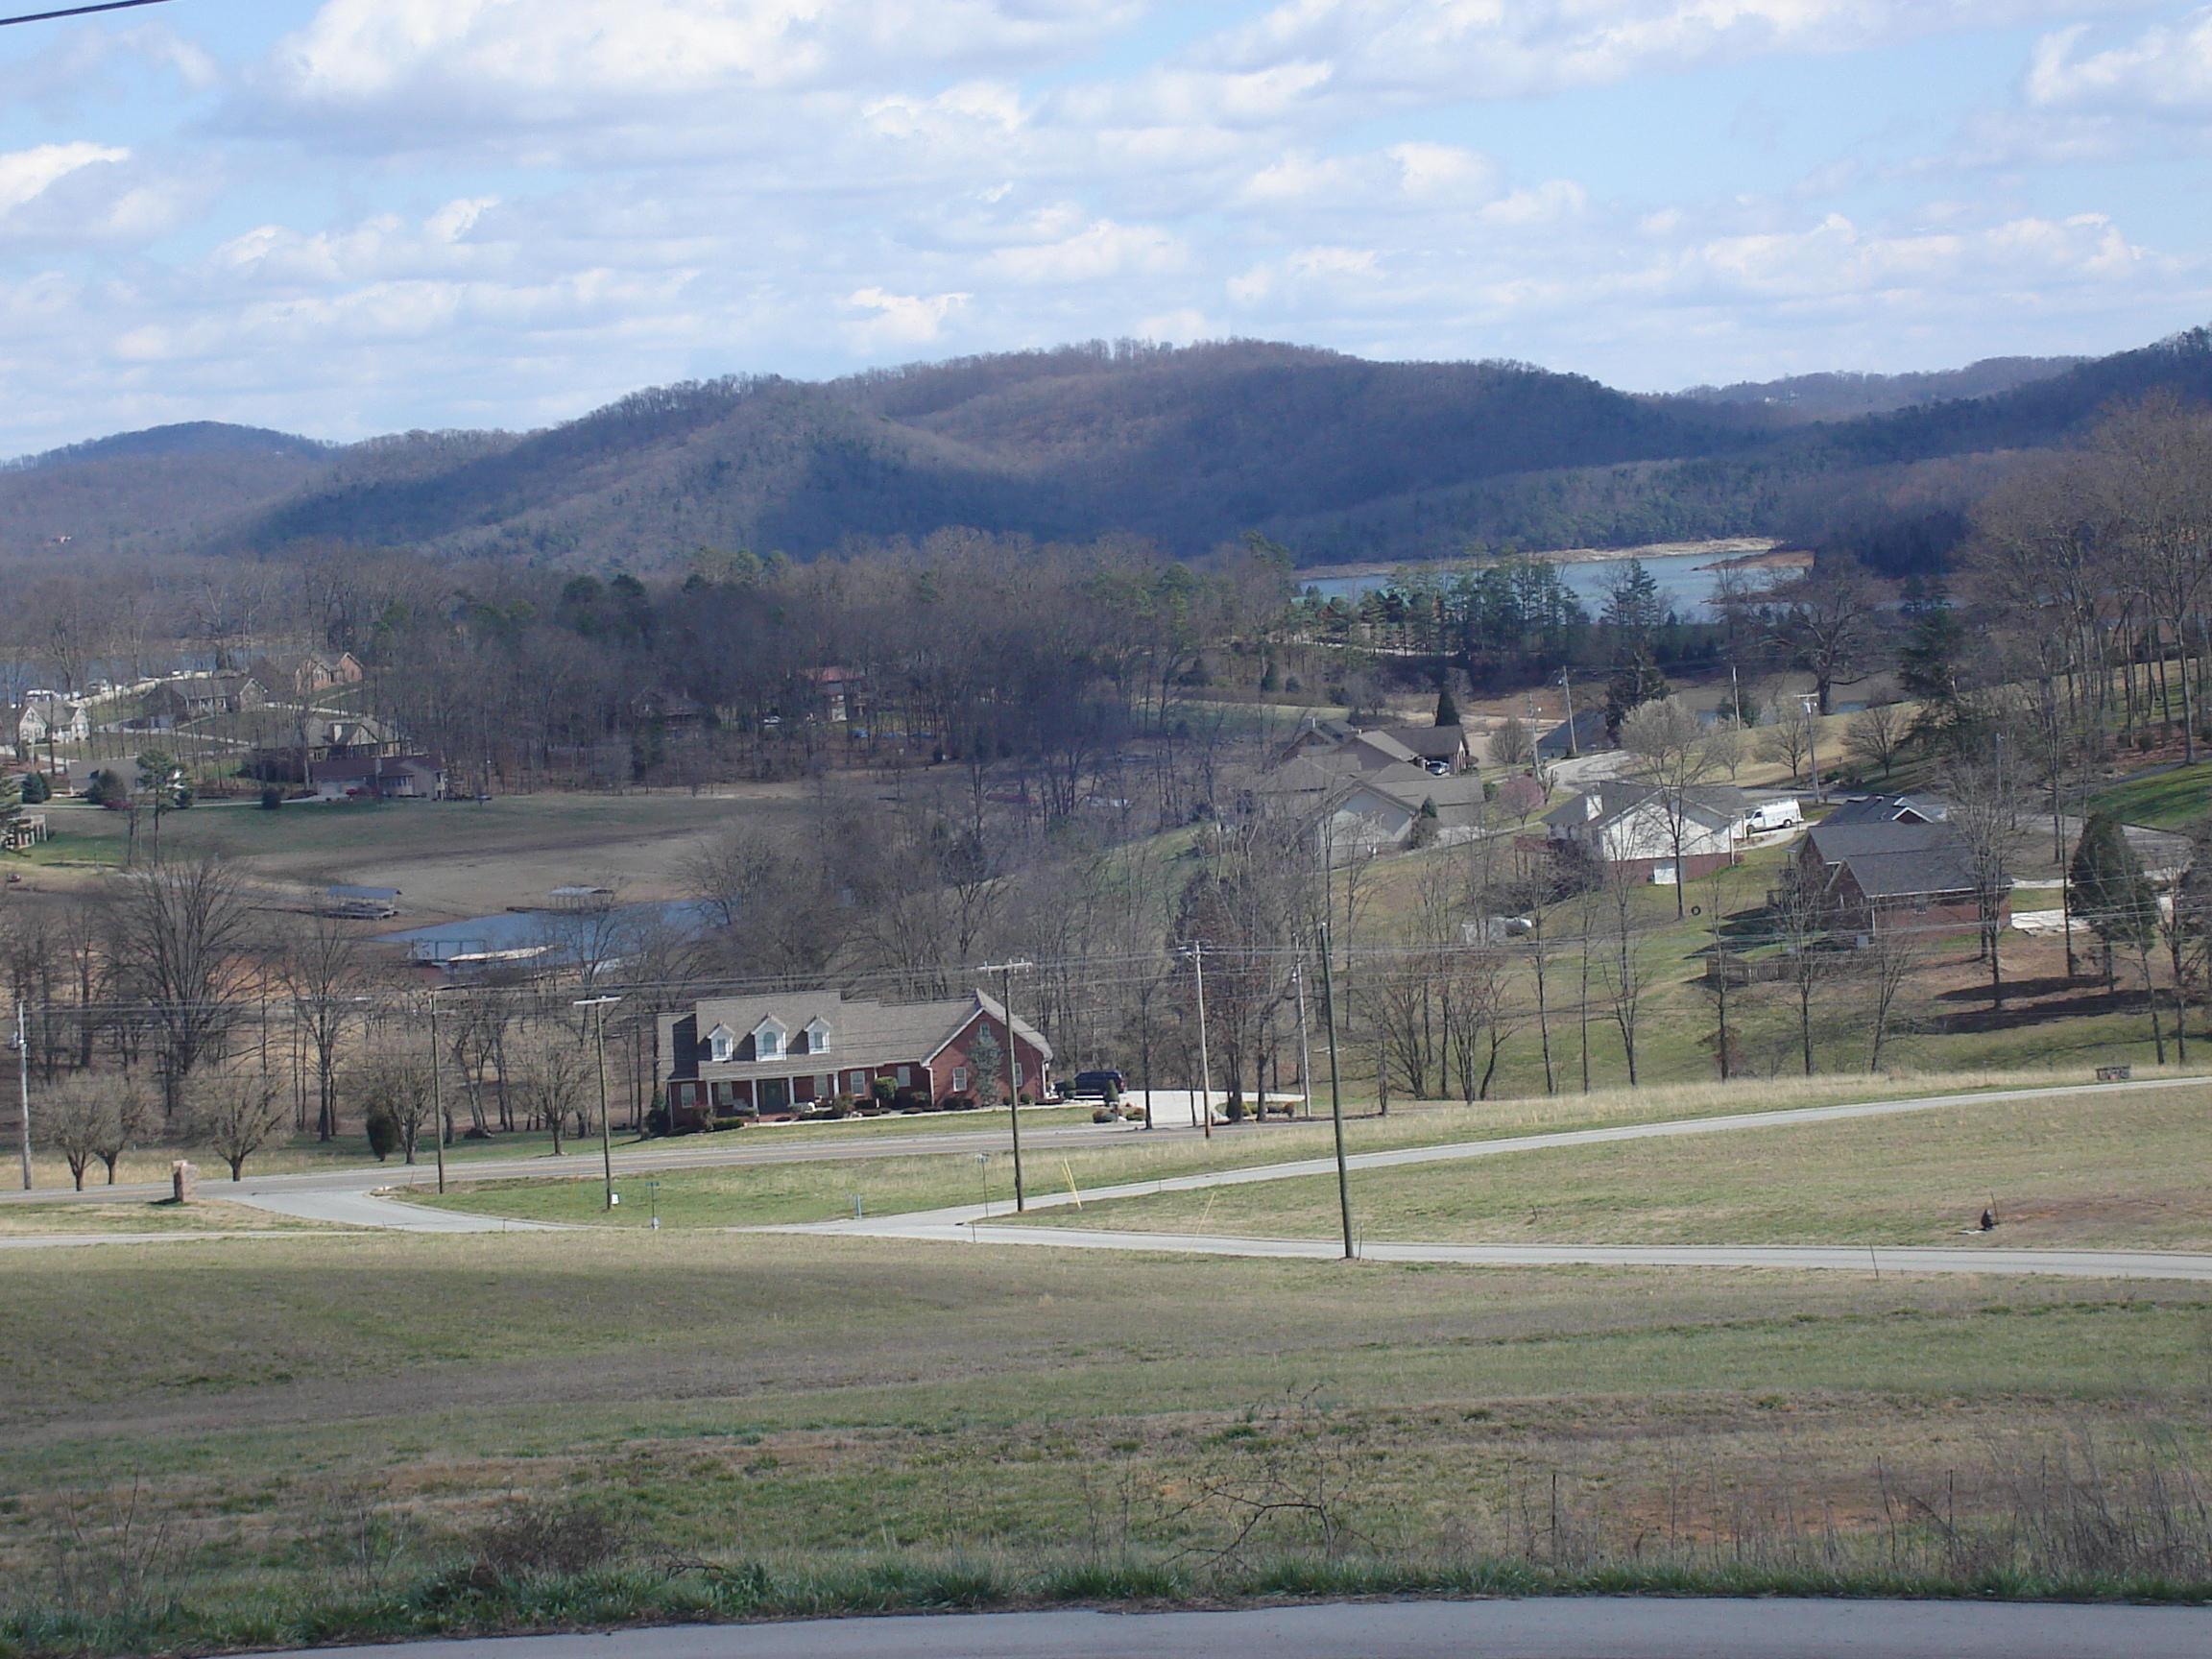 Lot 34 Chavis Lane, Rutledge, Tennessee 37861, ,Lots & Acreage,For Sale,Chavis,886484